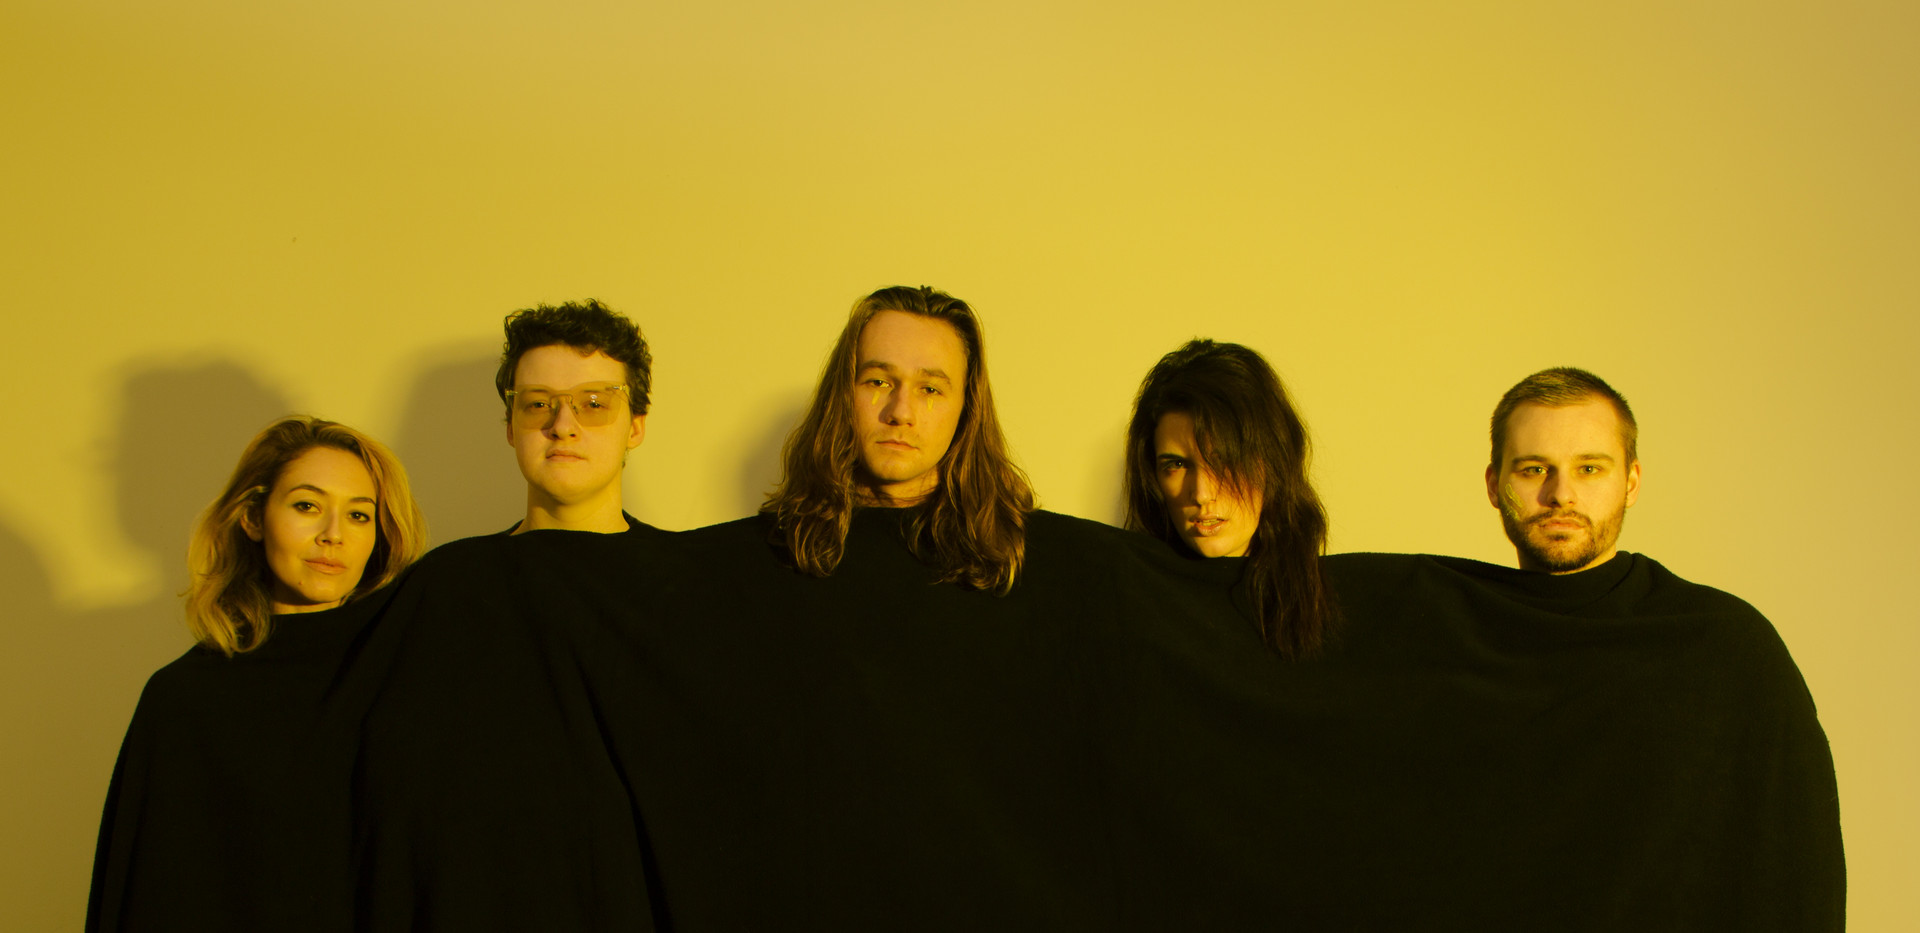 Band Heads